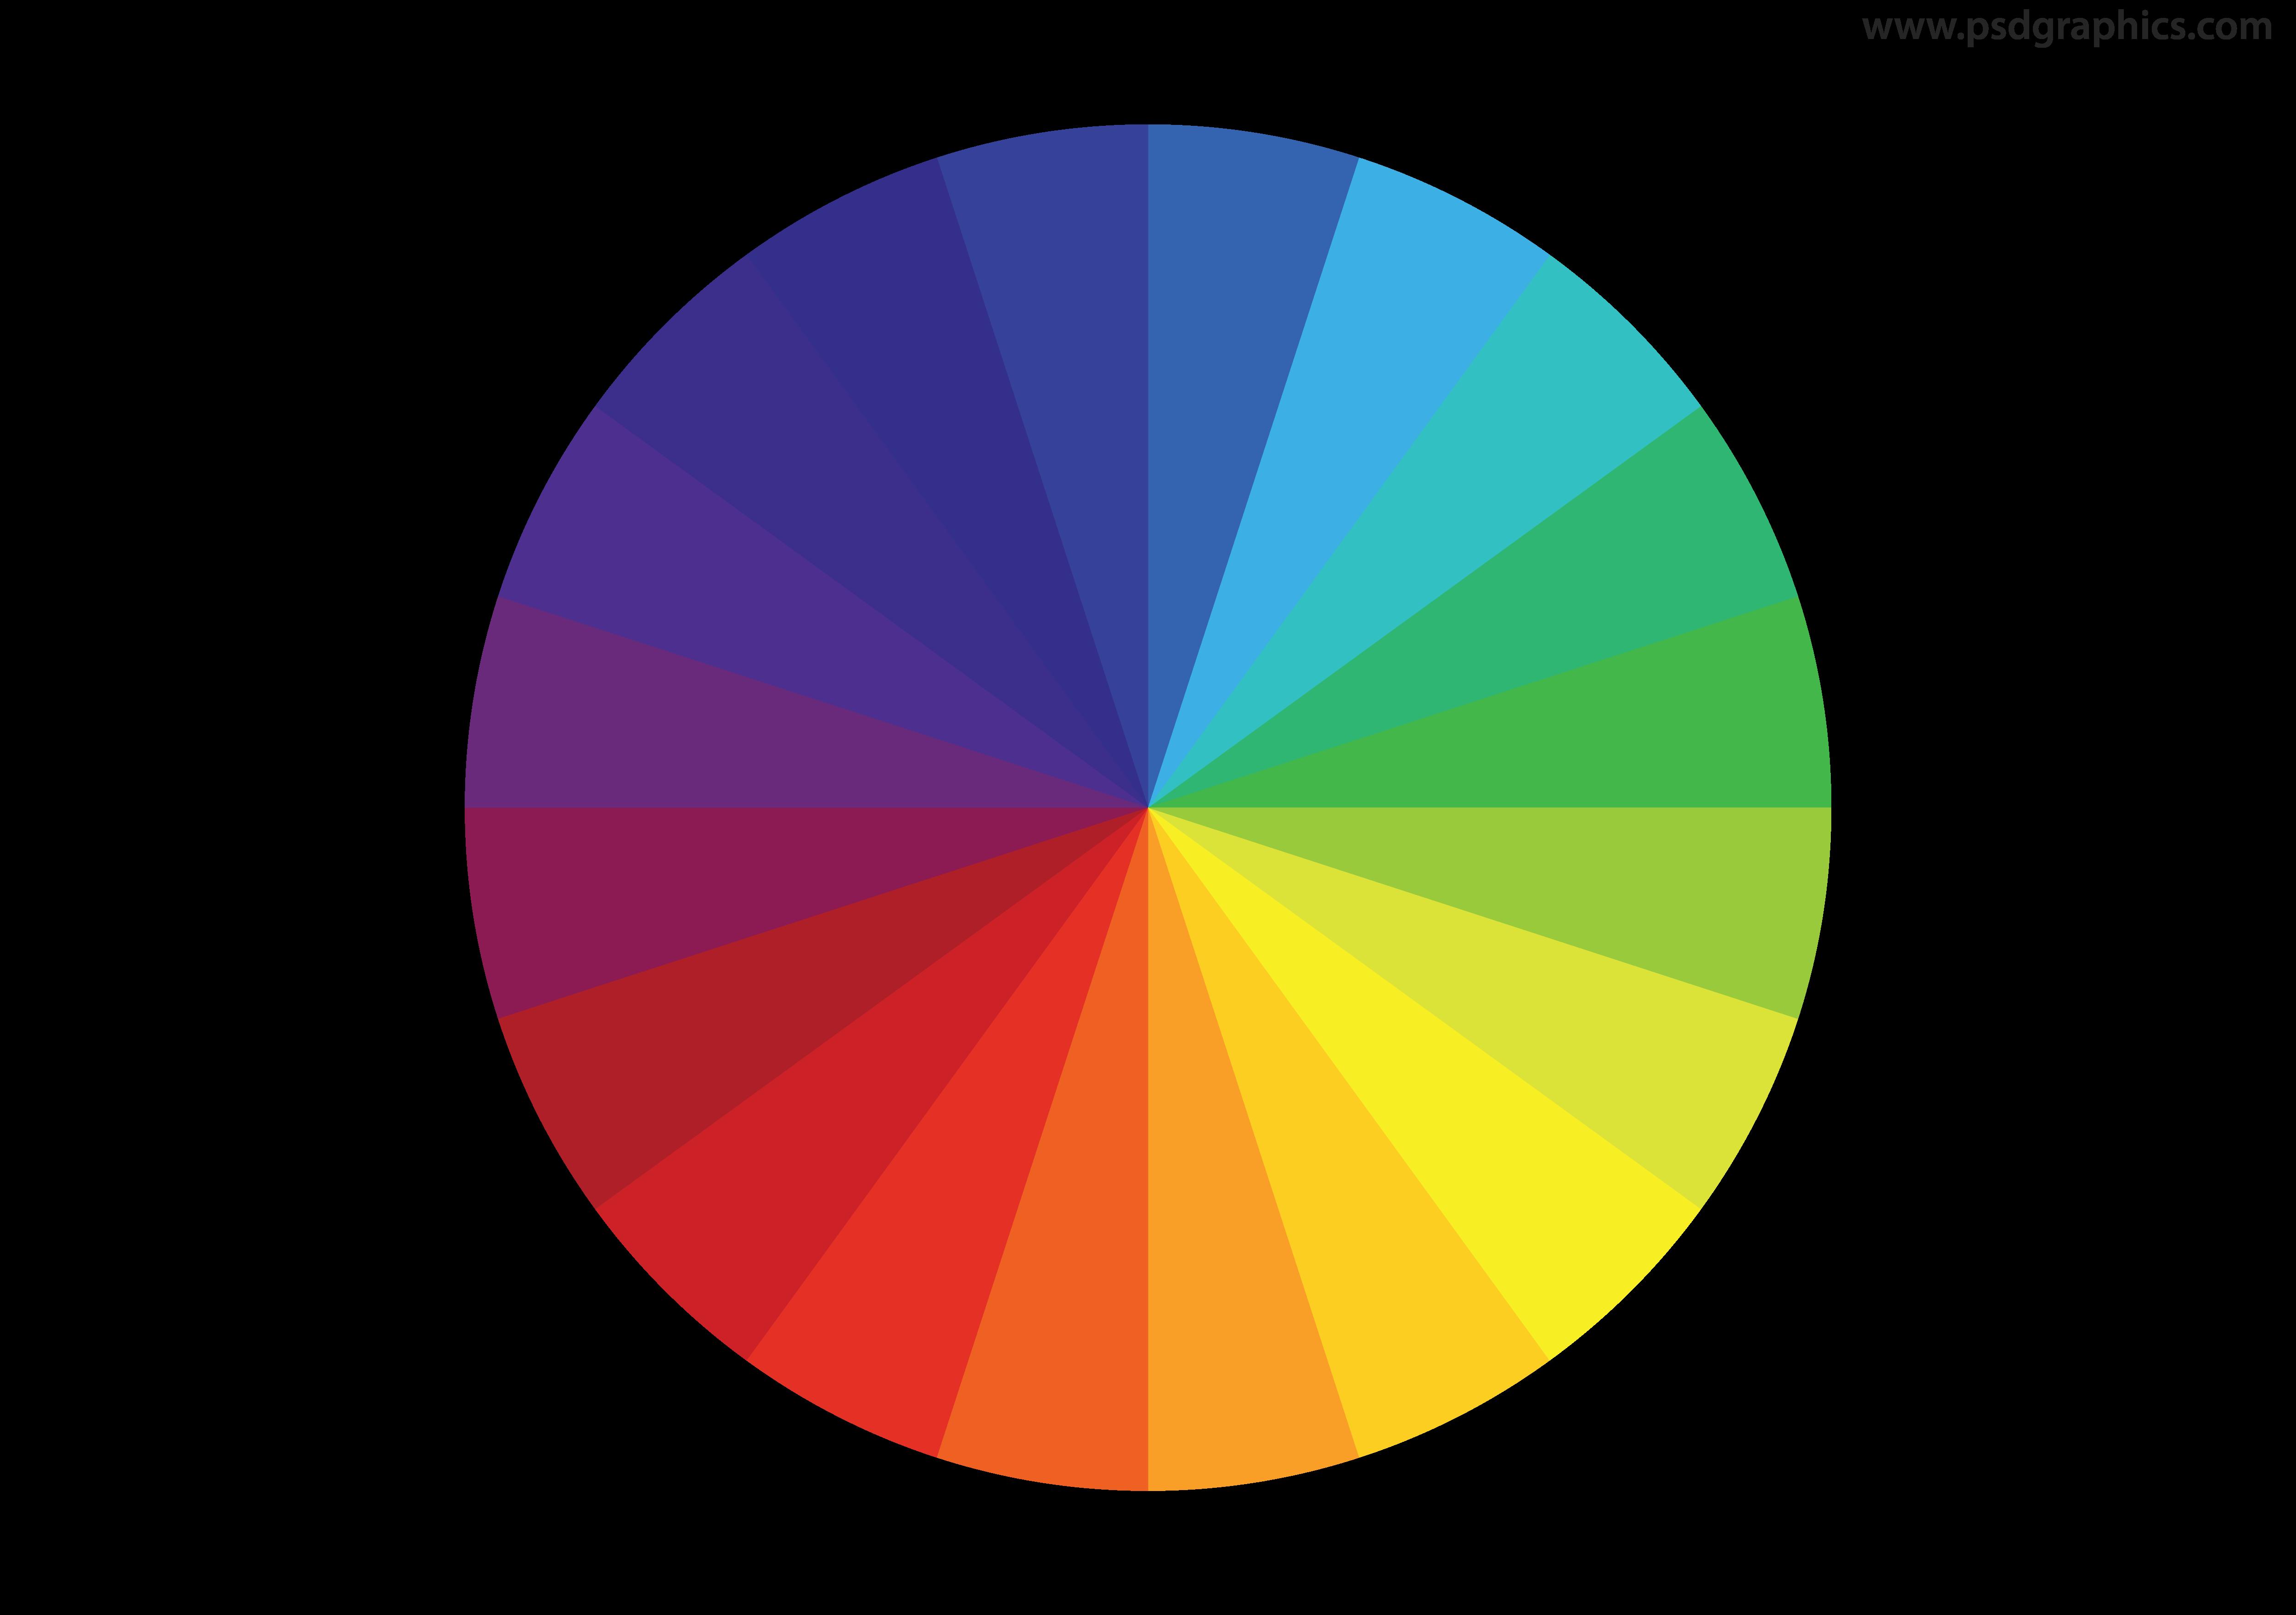 Color Wheel Vector Psdgraphics